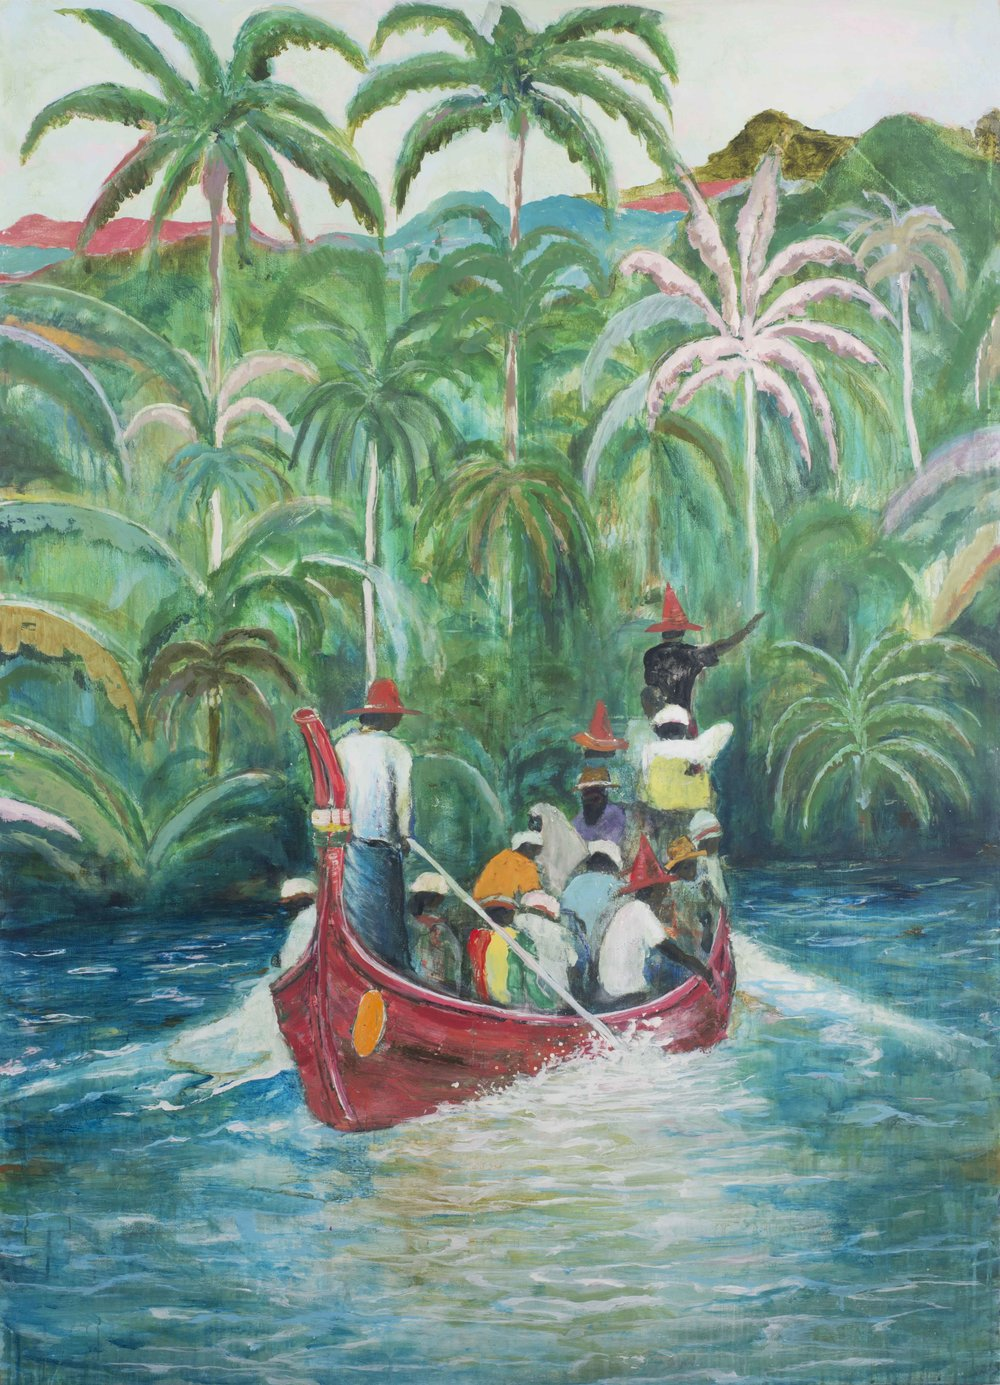 Adam Lester 'Mahaweli snake river' 2017, acrylic and oil on canvas, 170.0 x 122.0 cm